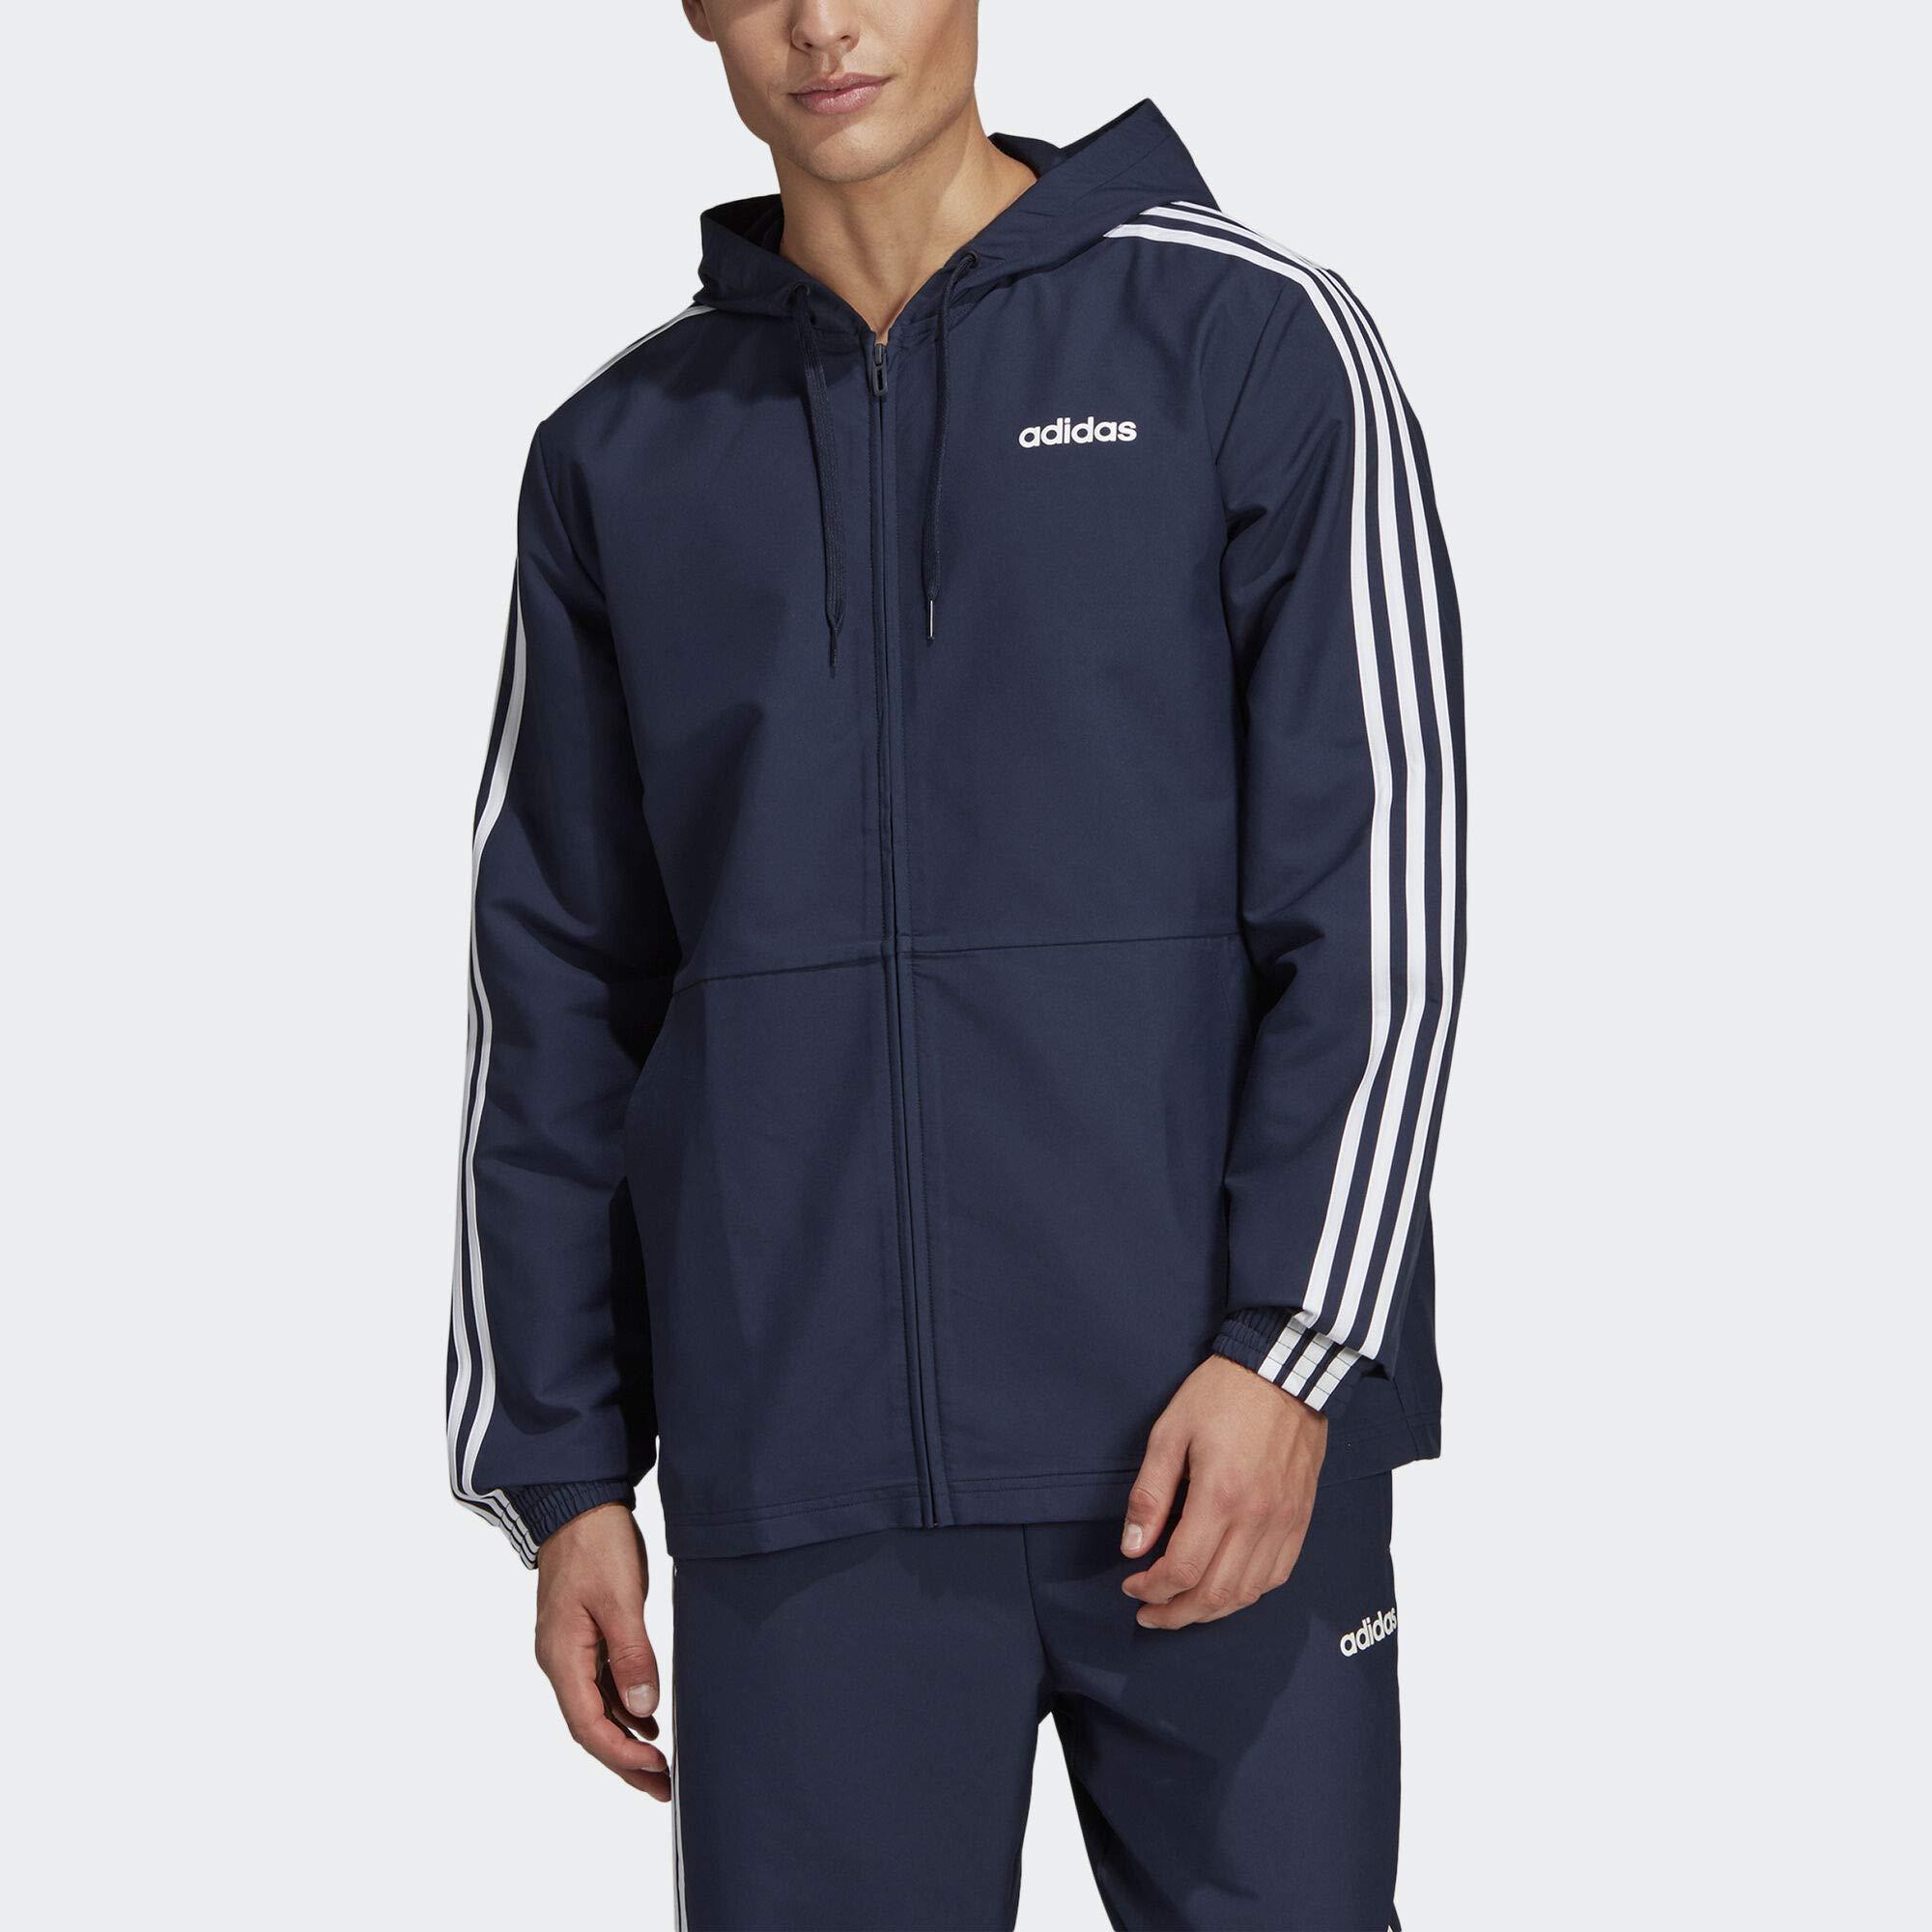 adidas Essentials Men's 3-Stripes Windbreaker, Legend Ink/White, XX-Large by adidas